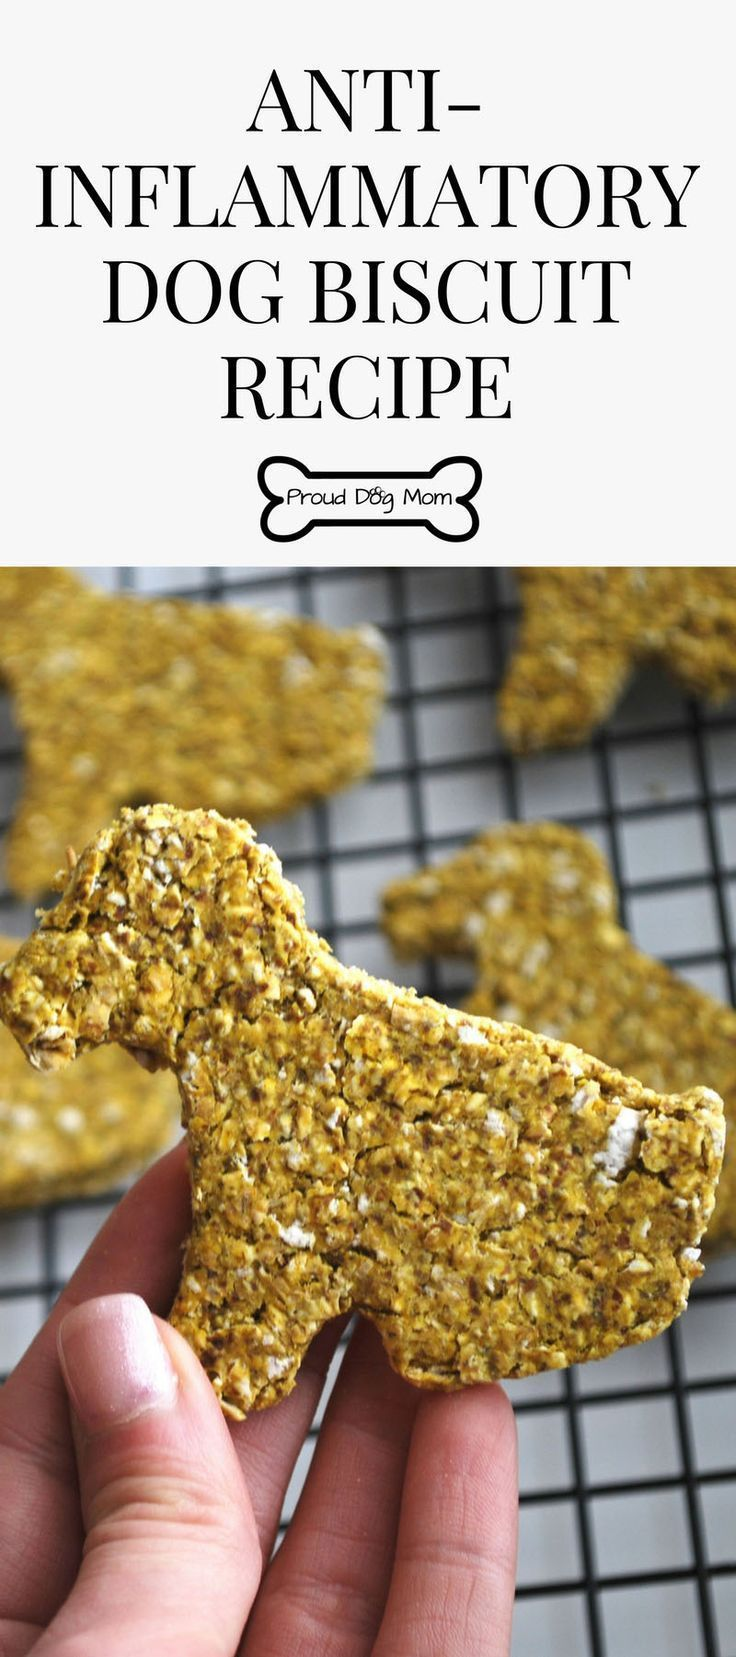 Anti-Inflammatory Dog Biscuit Recipe | Homemade Dog Treats | DIY Dog Treats | Gluten-Free Dog Treat Recipe |  via @KaufmannsPuppy